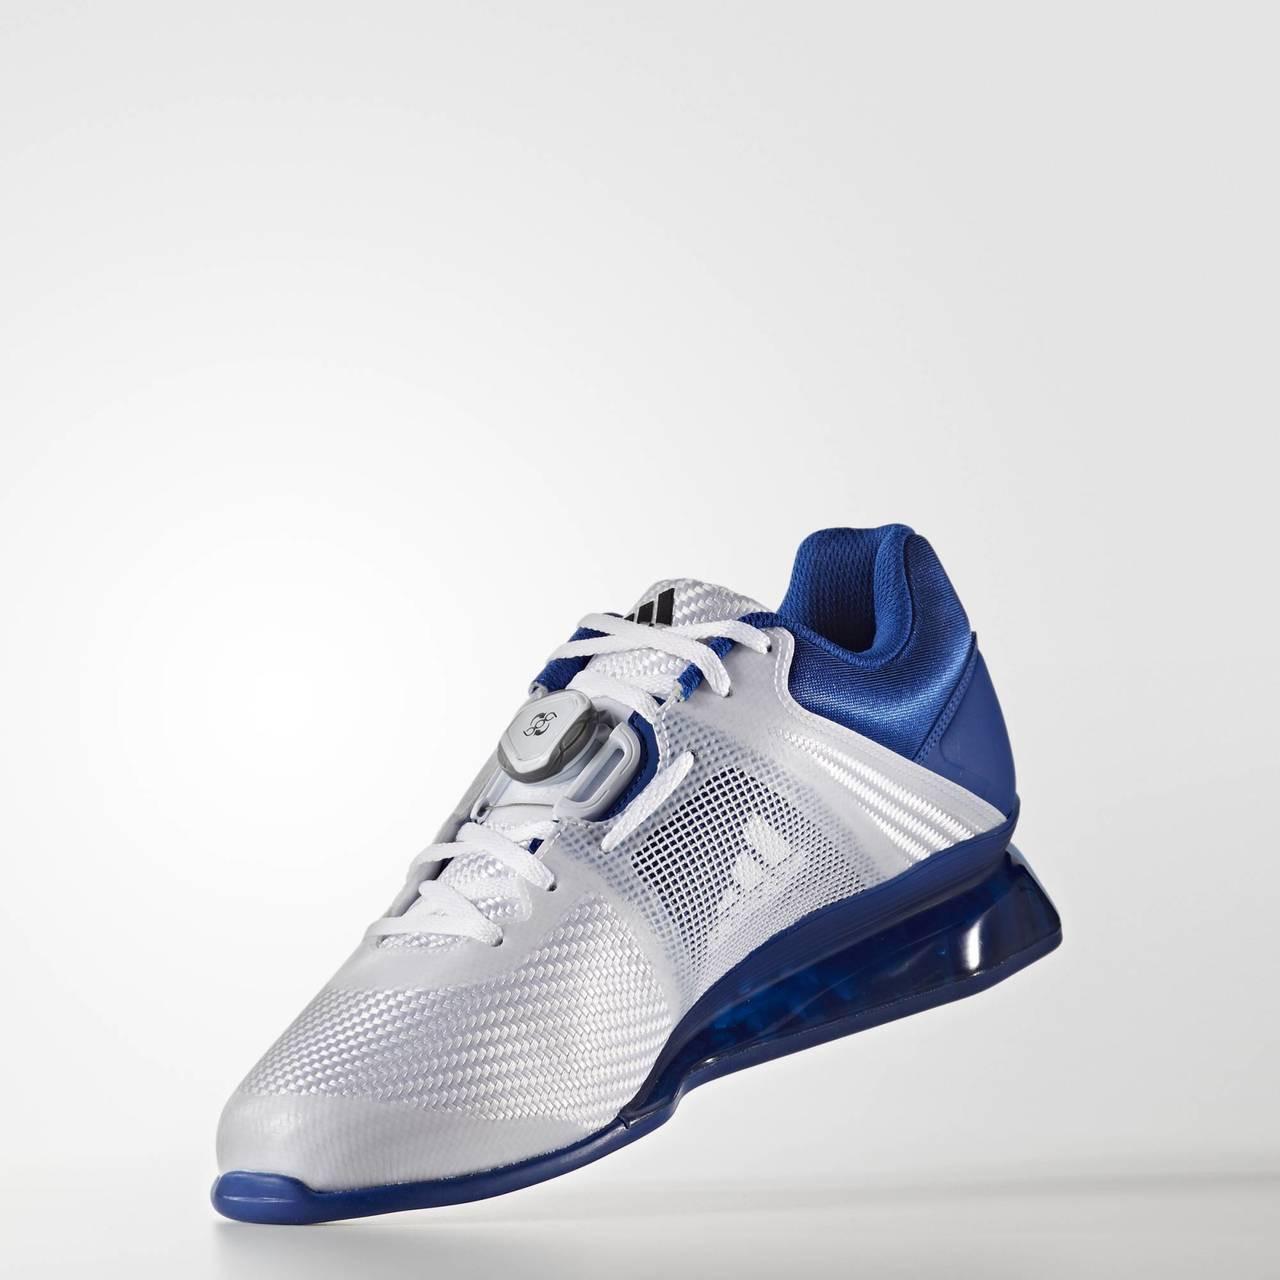 sports shoes bcc70 ae333 Adidas Leistung 16 II Royal Blue Weightlifting Shoe (BA9172)  www.battleboxuk.com